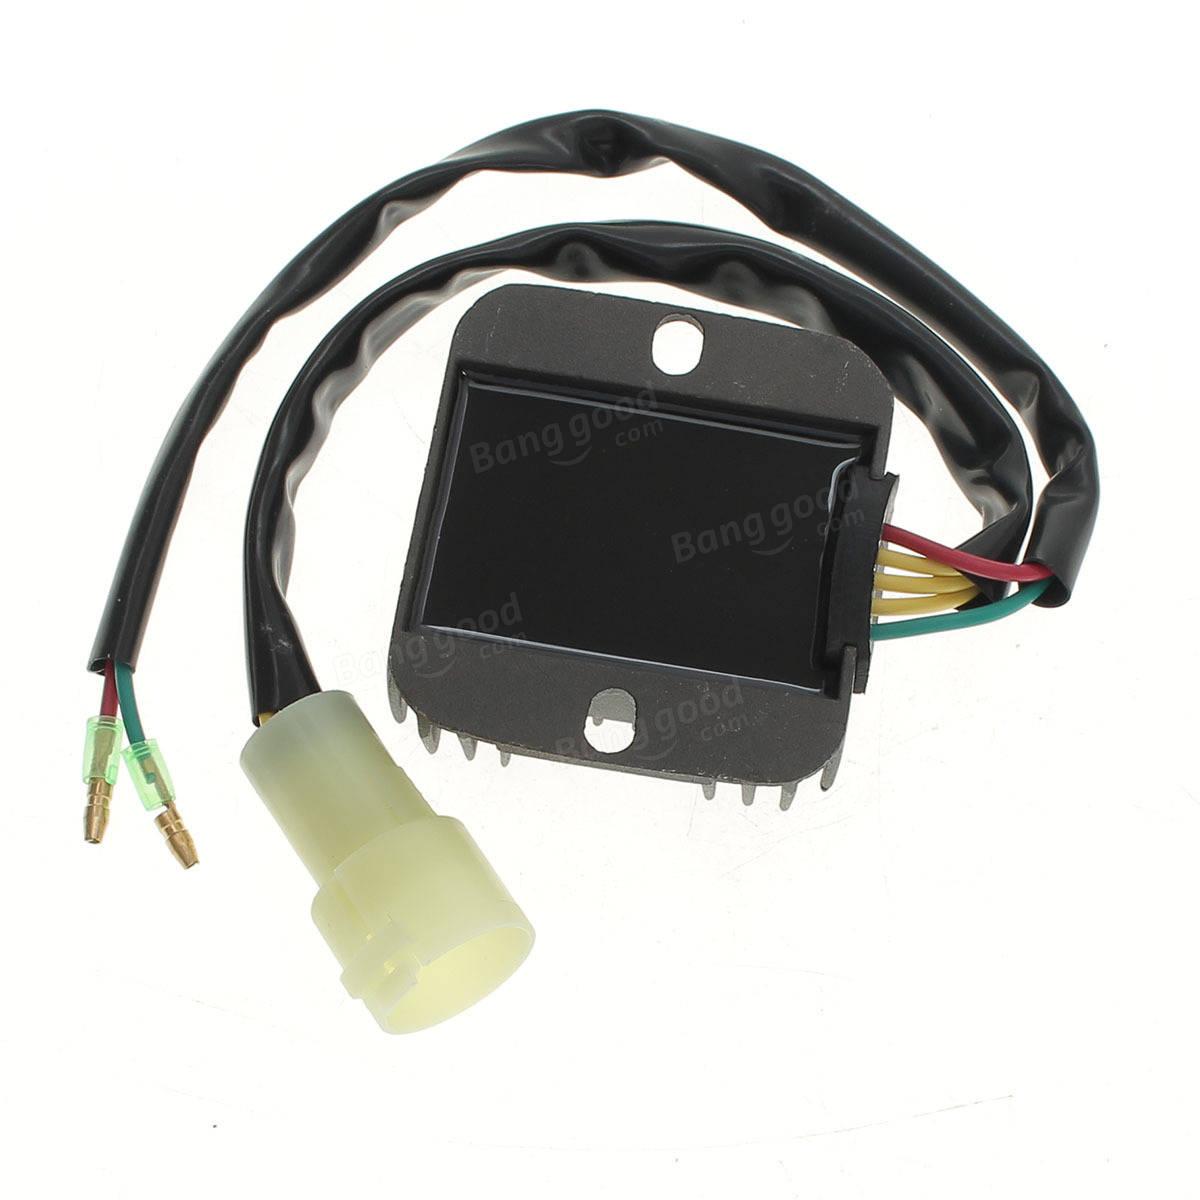 hight resolution of  honda b18c wiring diagram in addition honda gx160 wiring diagram furthermore wiring diagram of hero honda